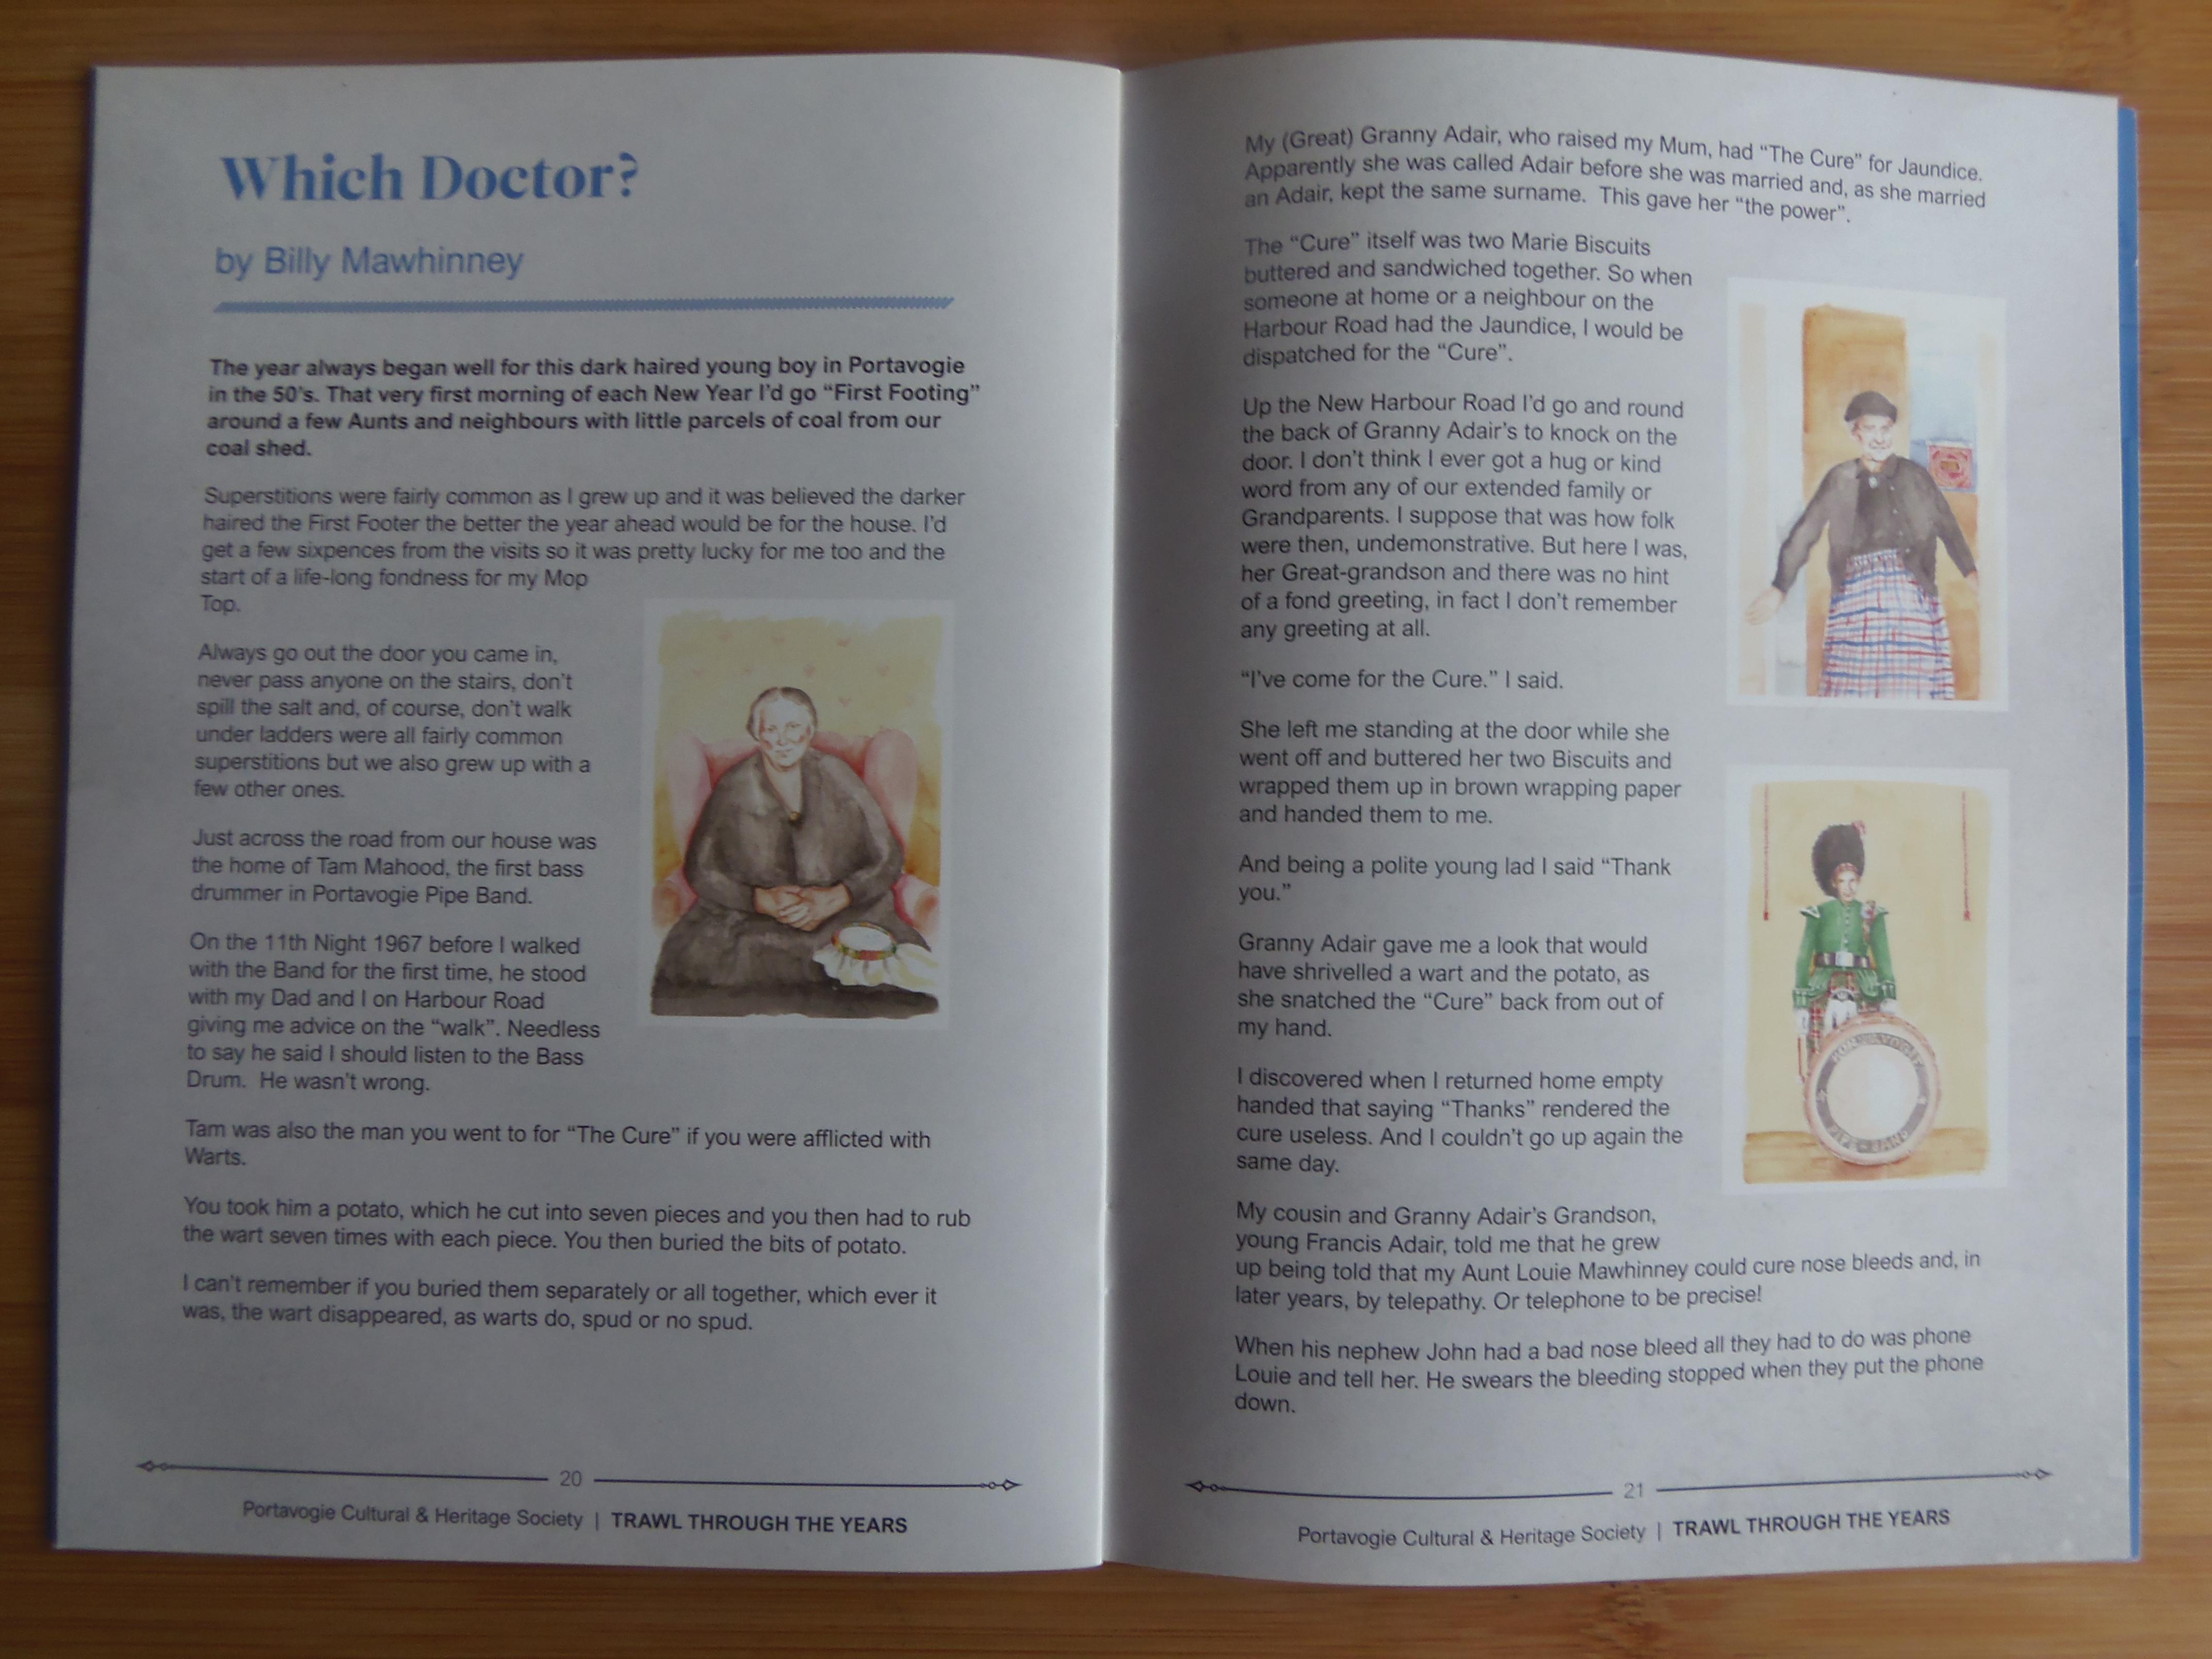 pg 20-21